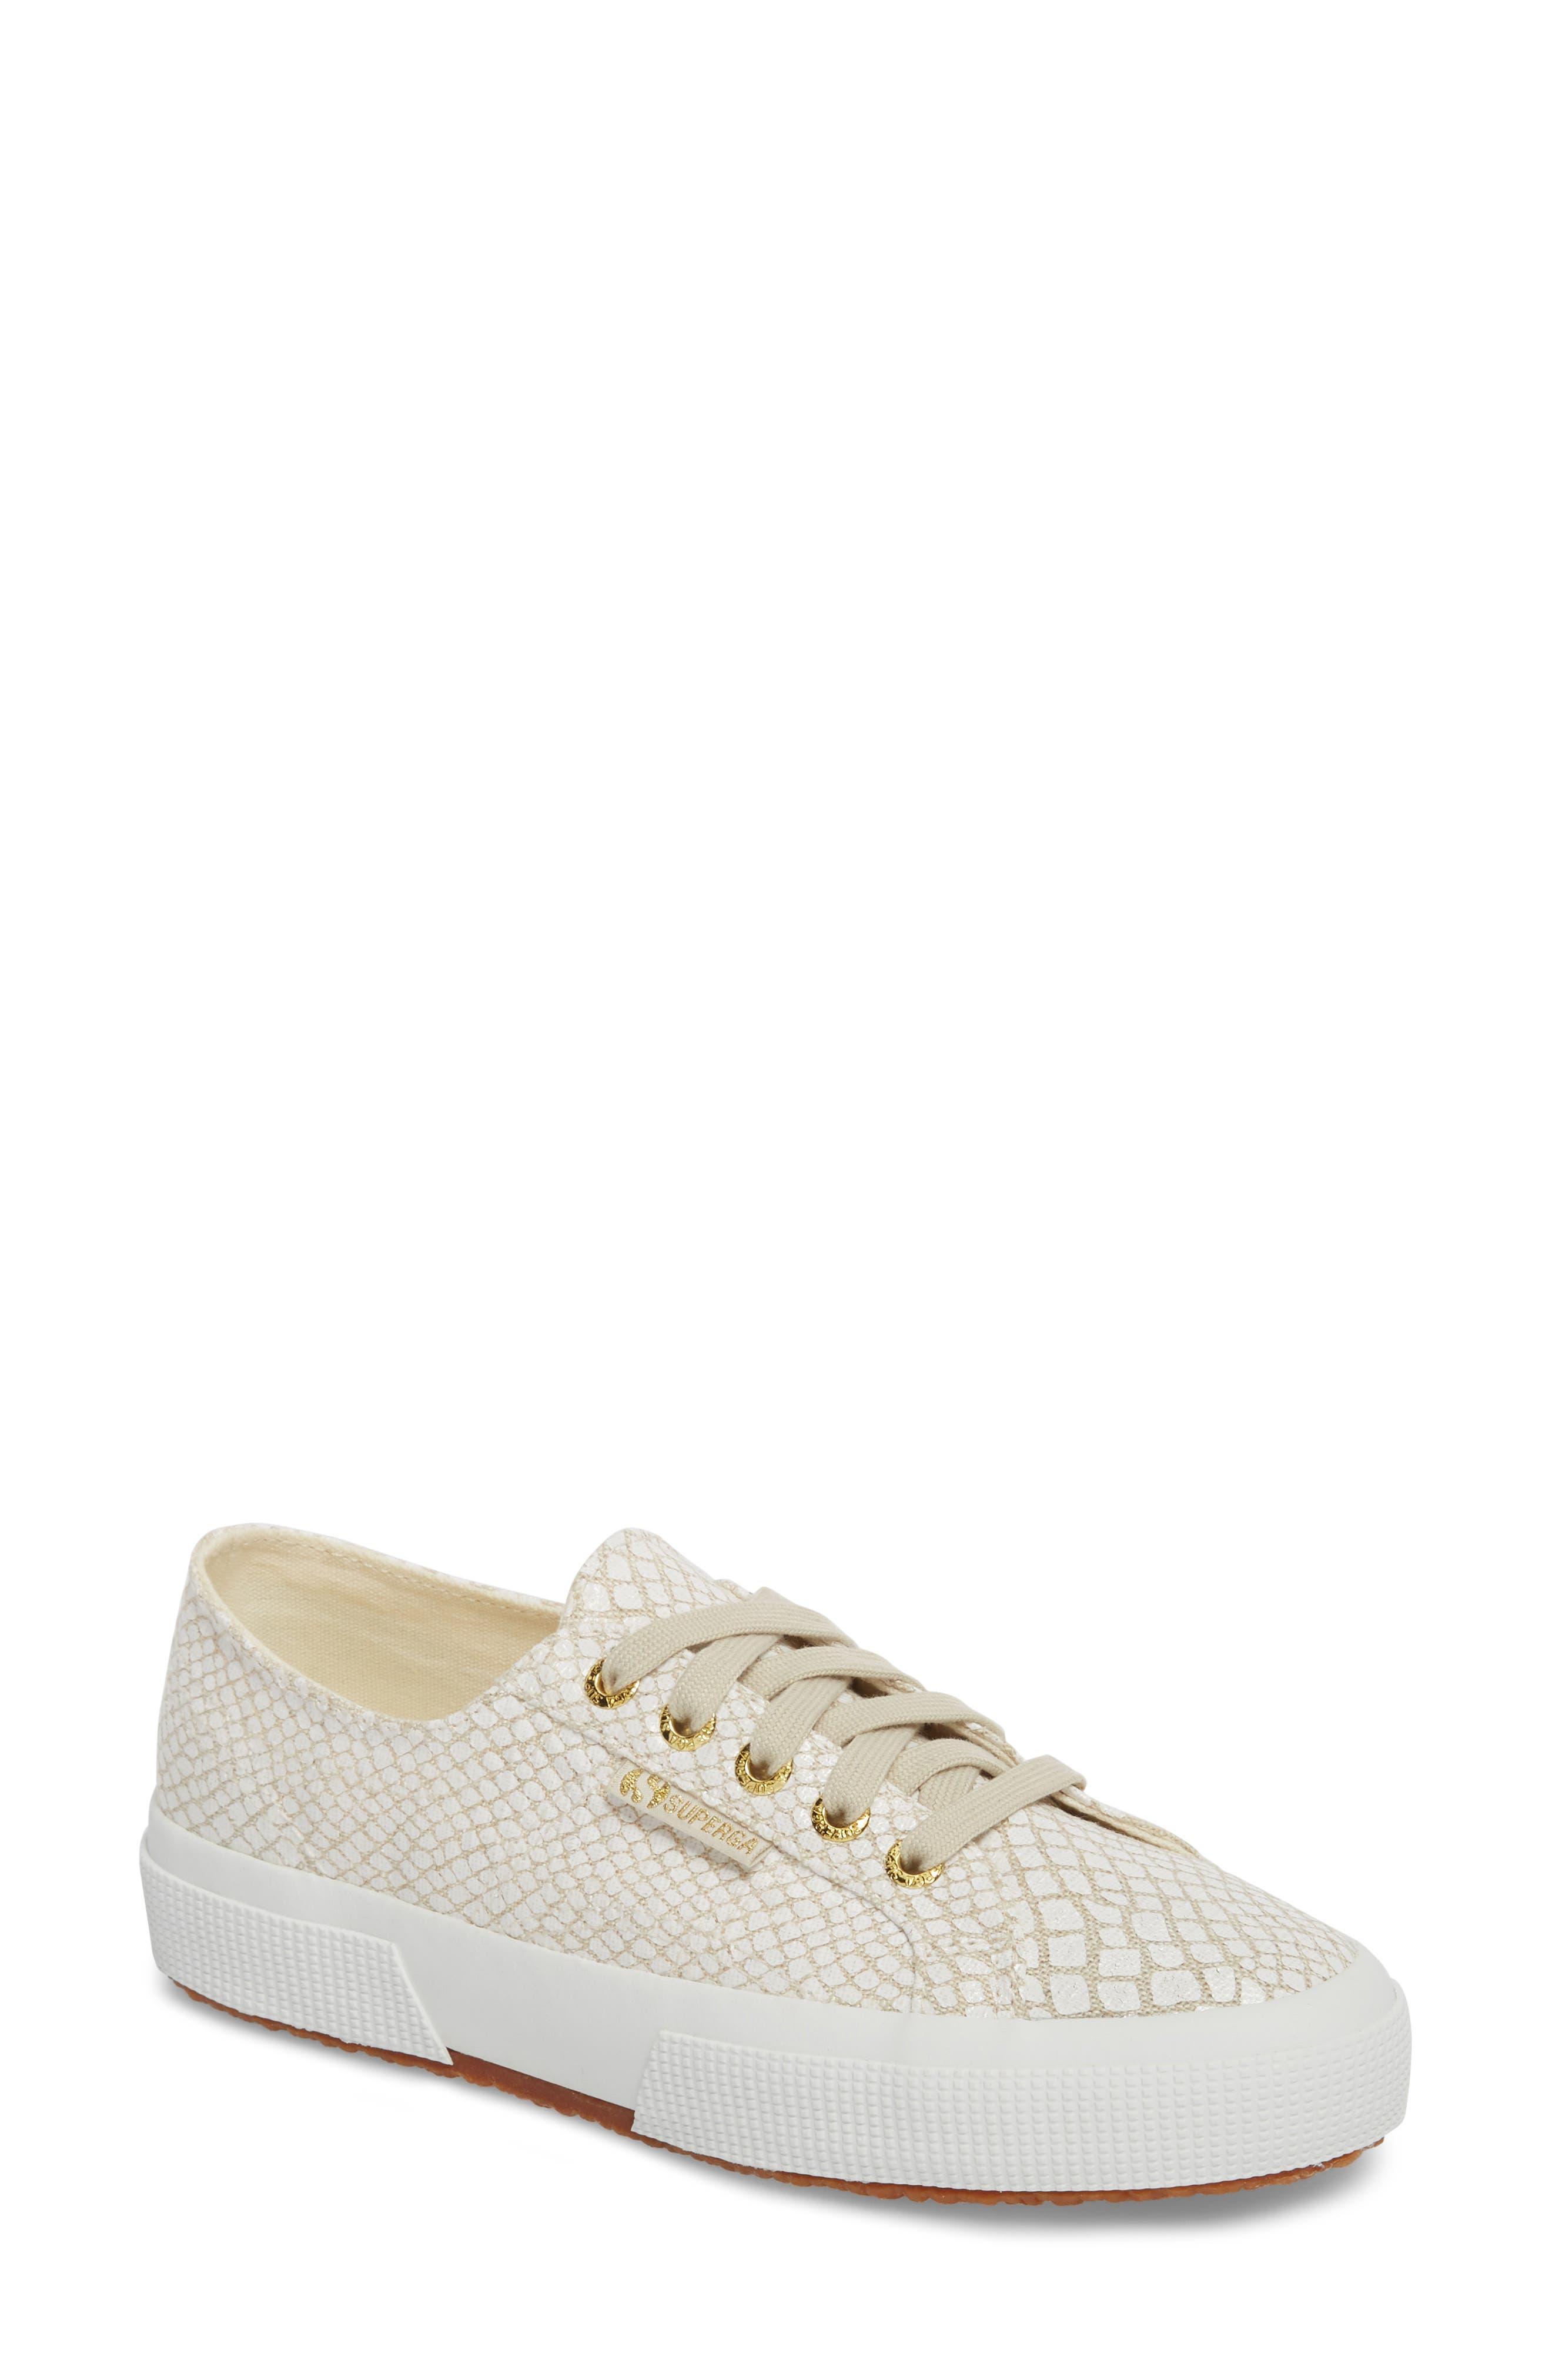 2750 Low Top Sneaker,                             Main thumbnail 1, color,                             White Multi